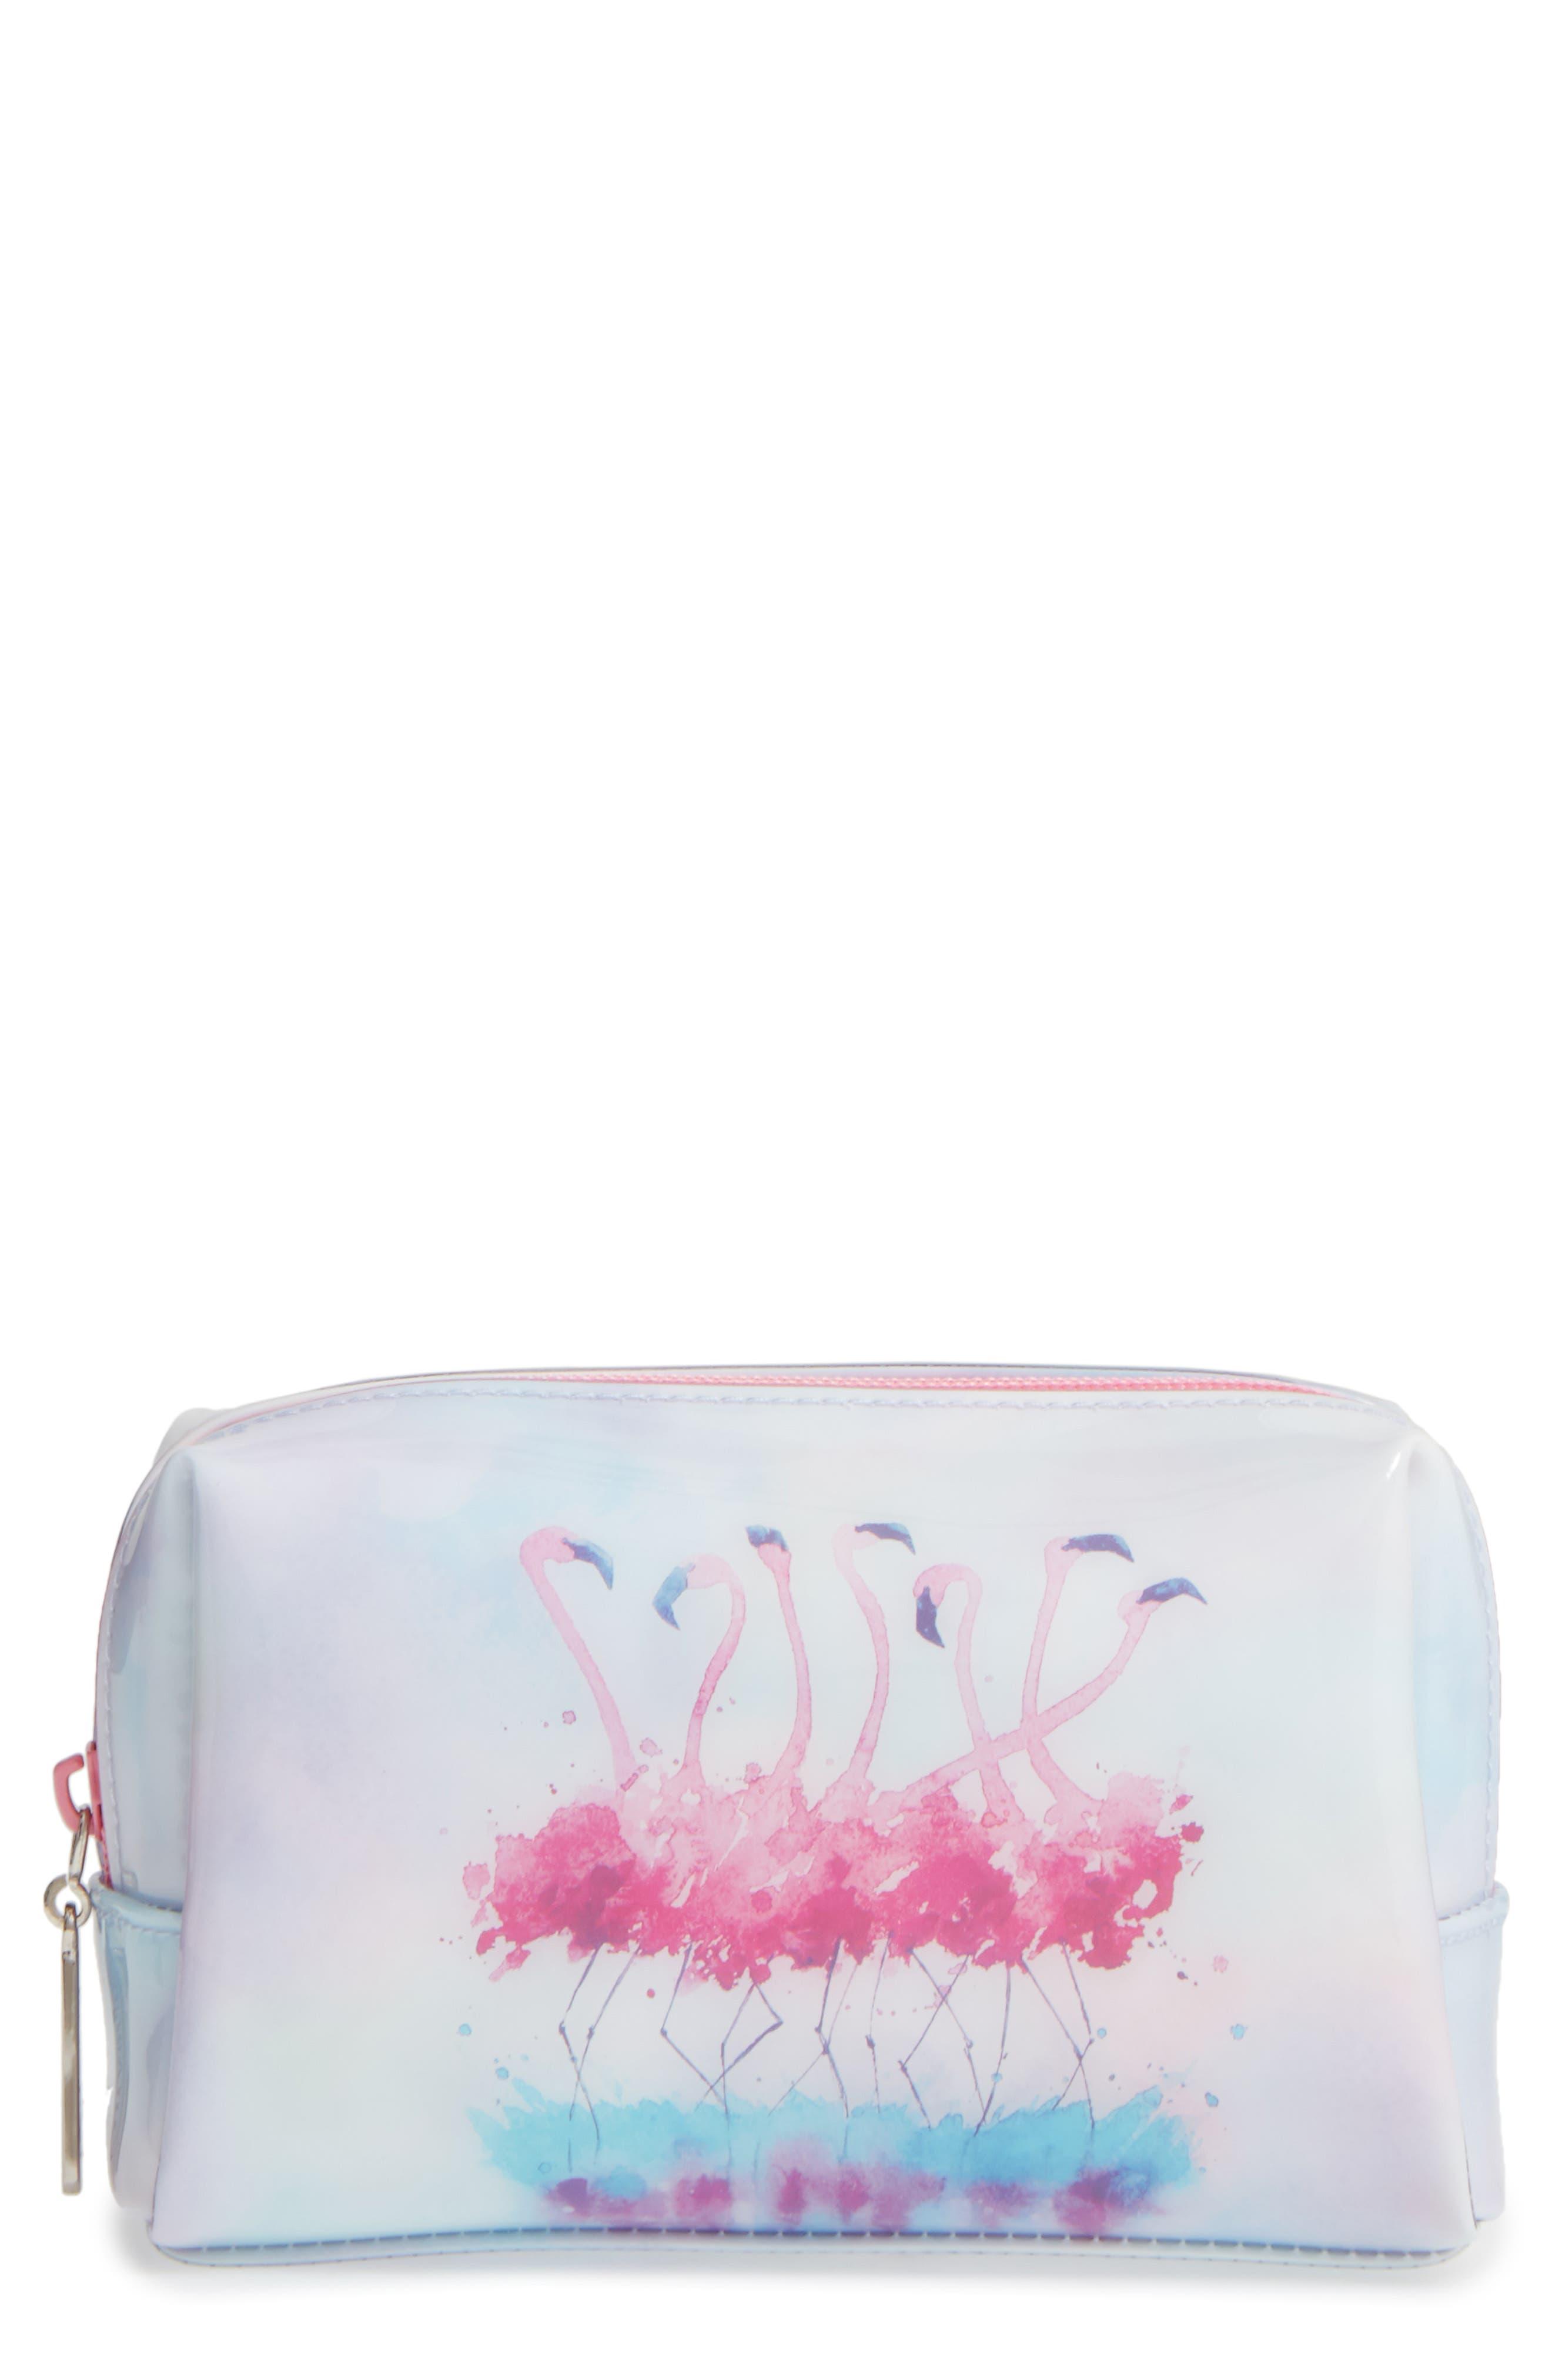 Main Image - Catseye London Flamingo Cosmetics Bag